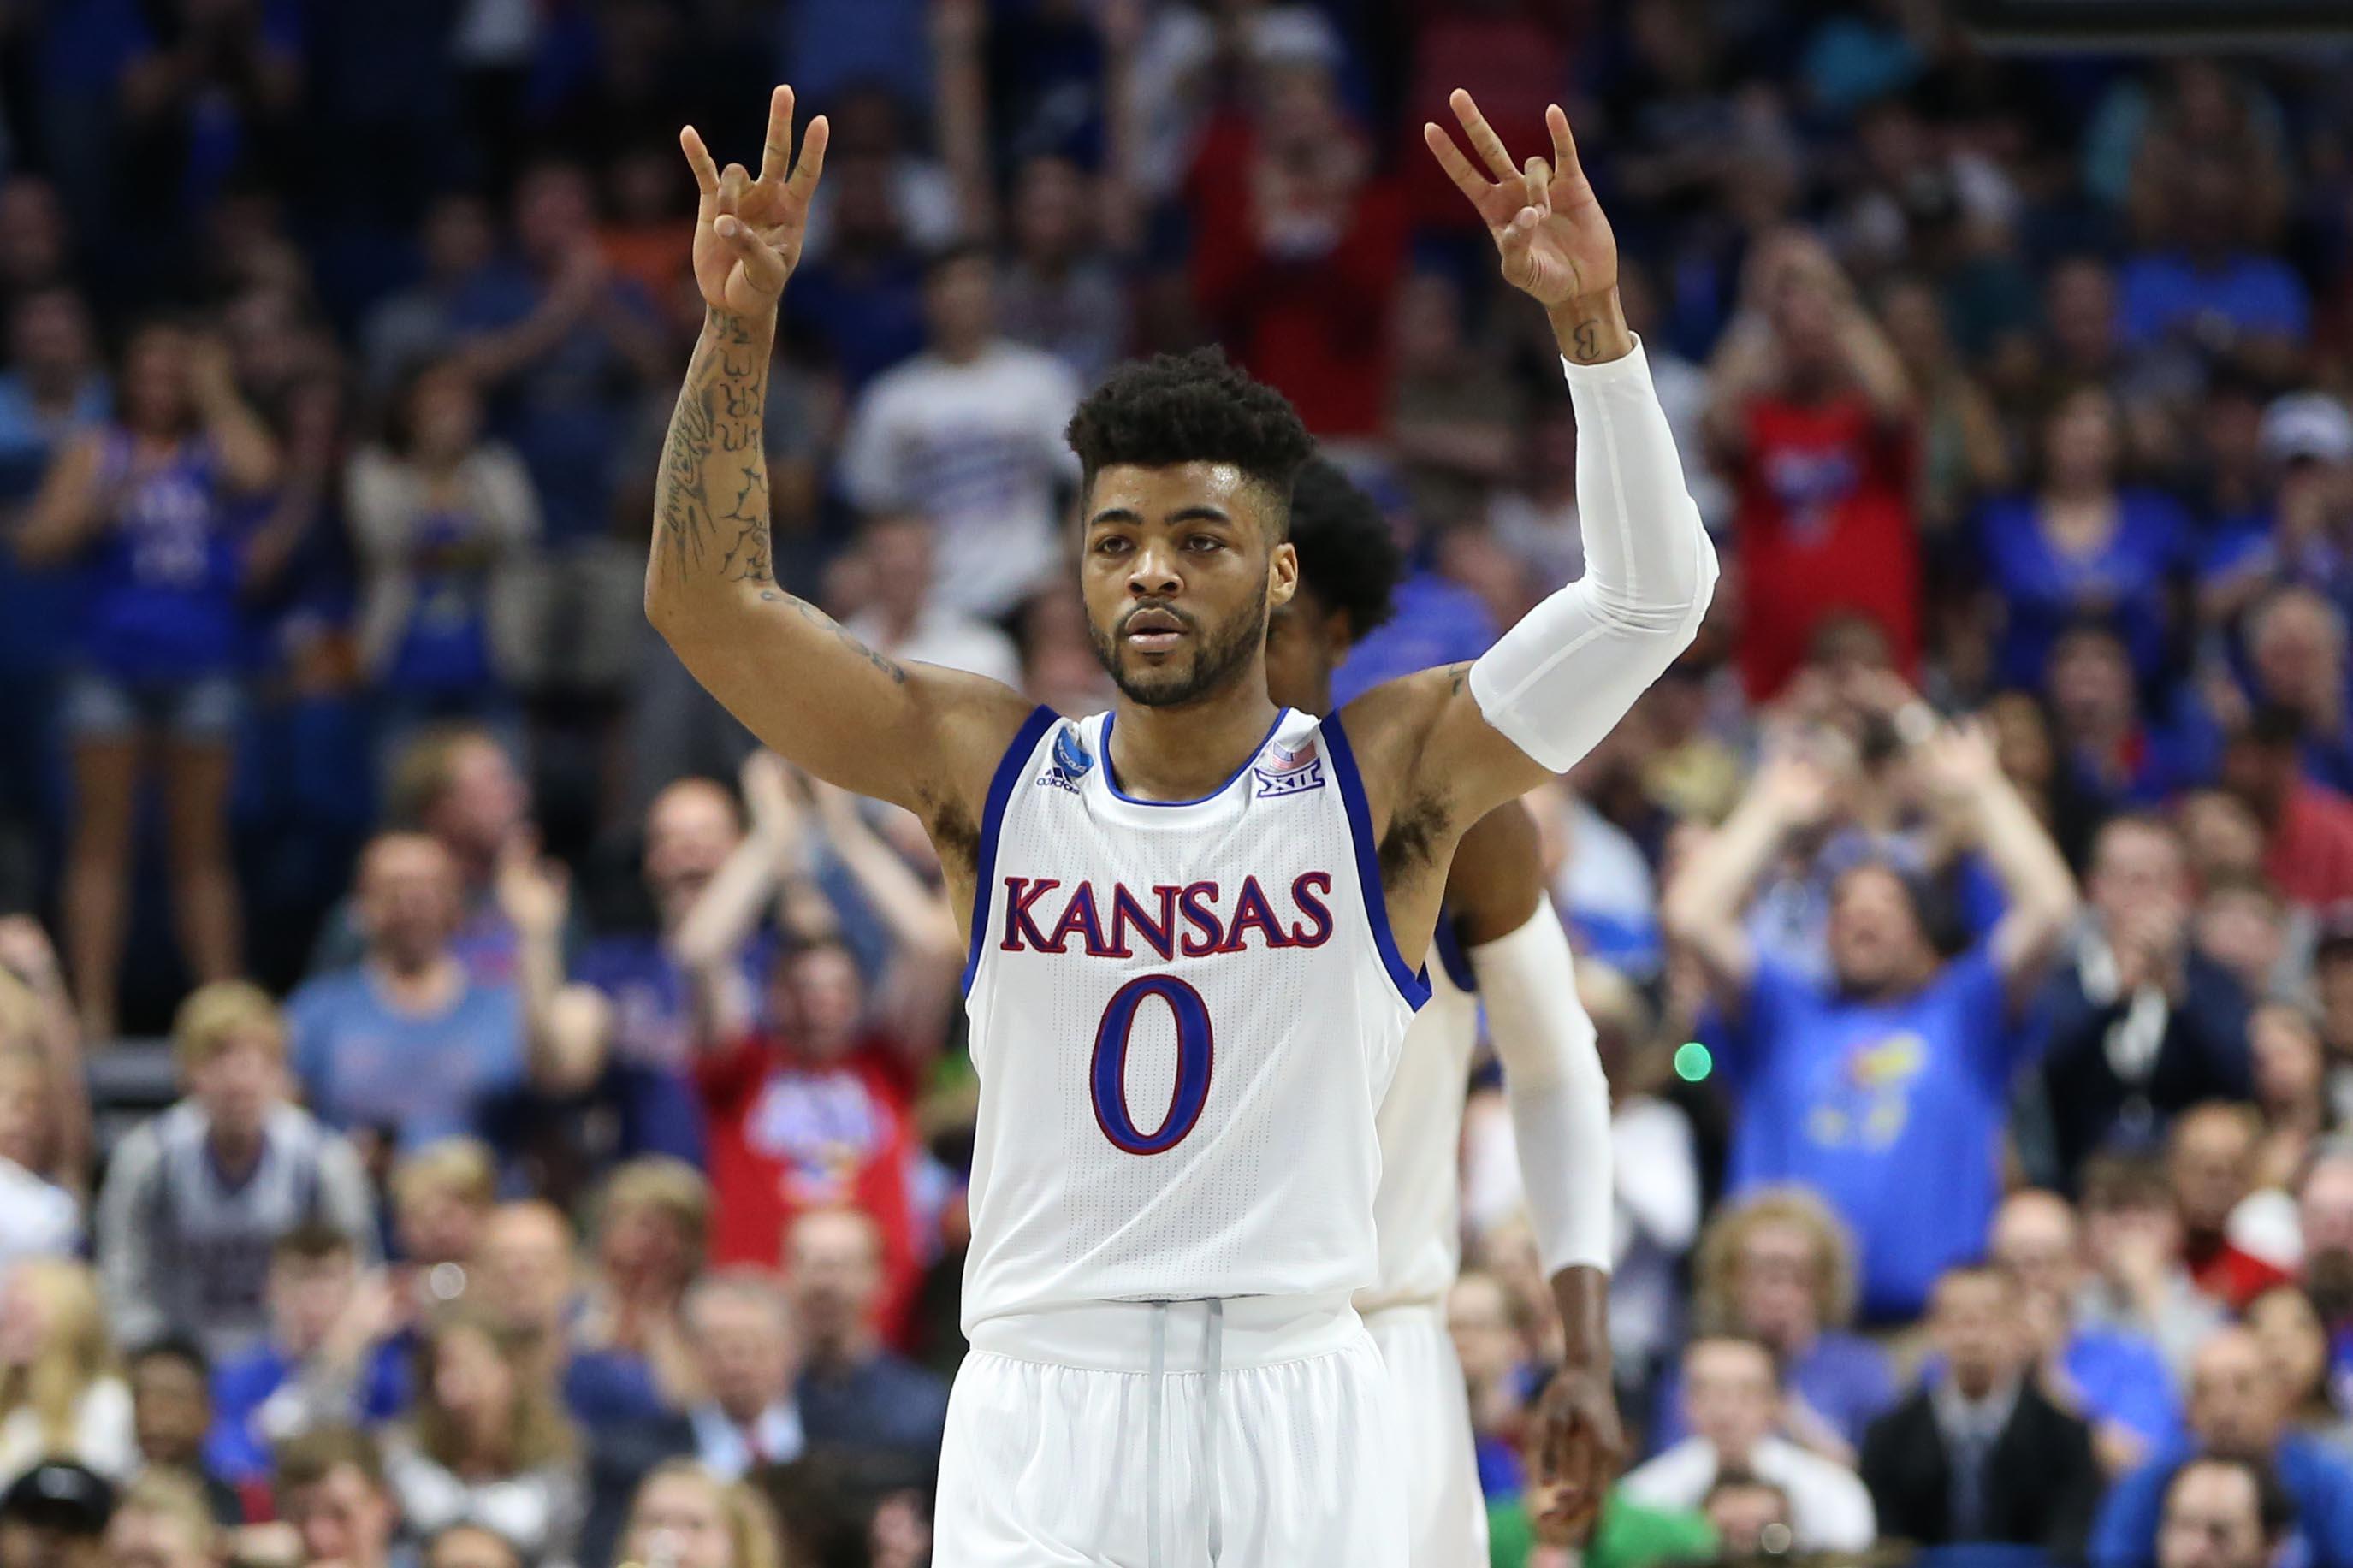 Uk Basketball: March Madness: Kansas Vs. Purdue Preview, Prediction, TV